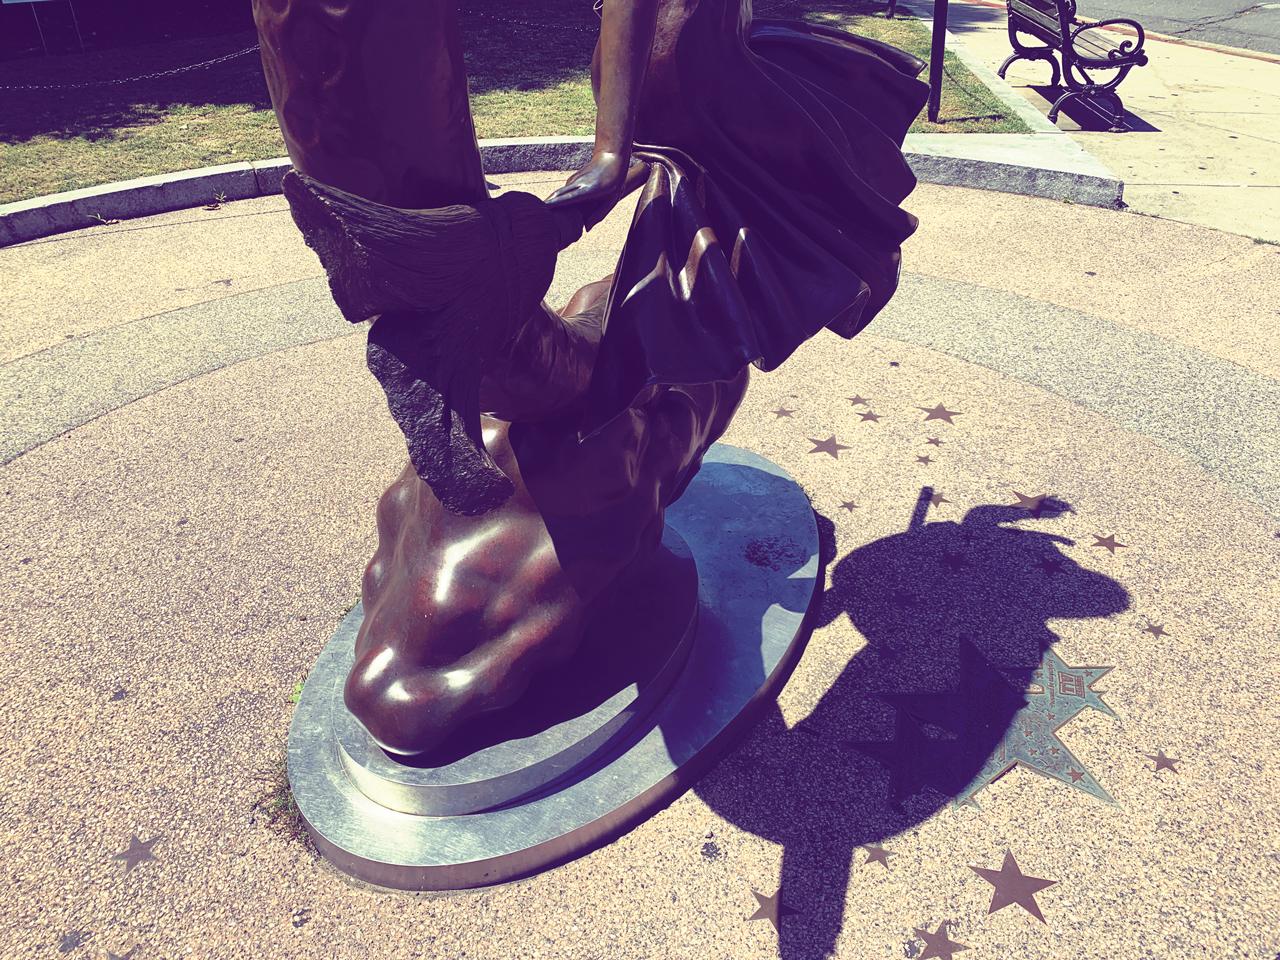 bewitched-statue-salem-massachusetts-1280x960-05